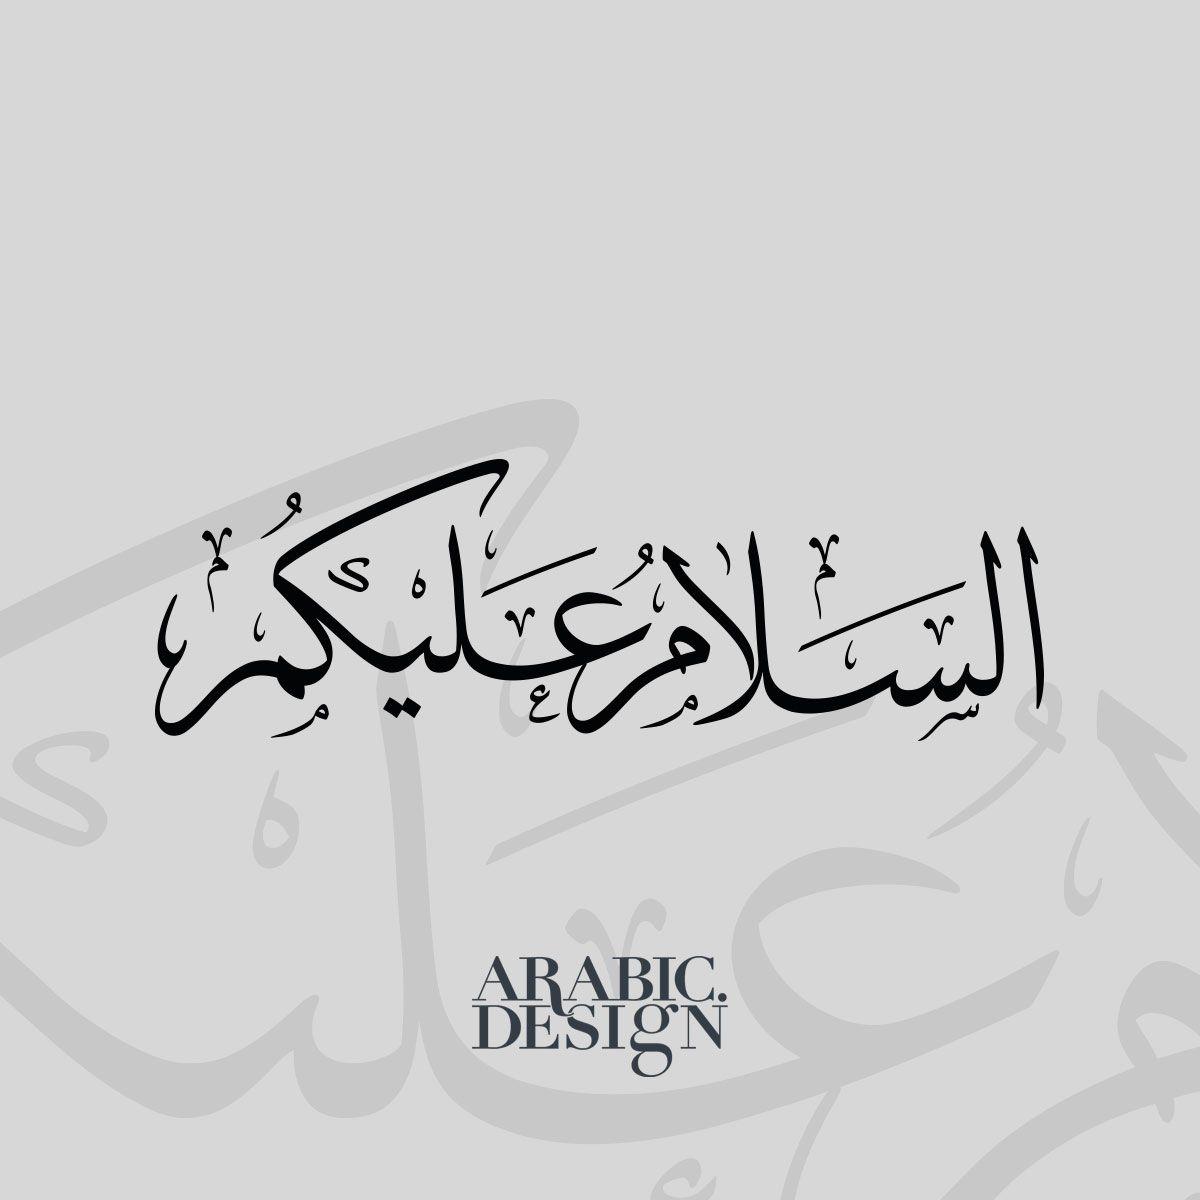 Arabic Design For Assalamualaikum In Arabic Arabic Design السلام عليكم Assalamualaikum In Arabic Arabic Design How To Write Calligraphy